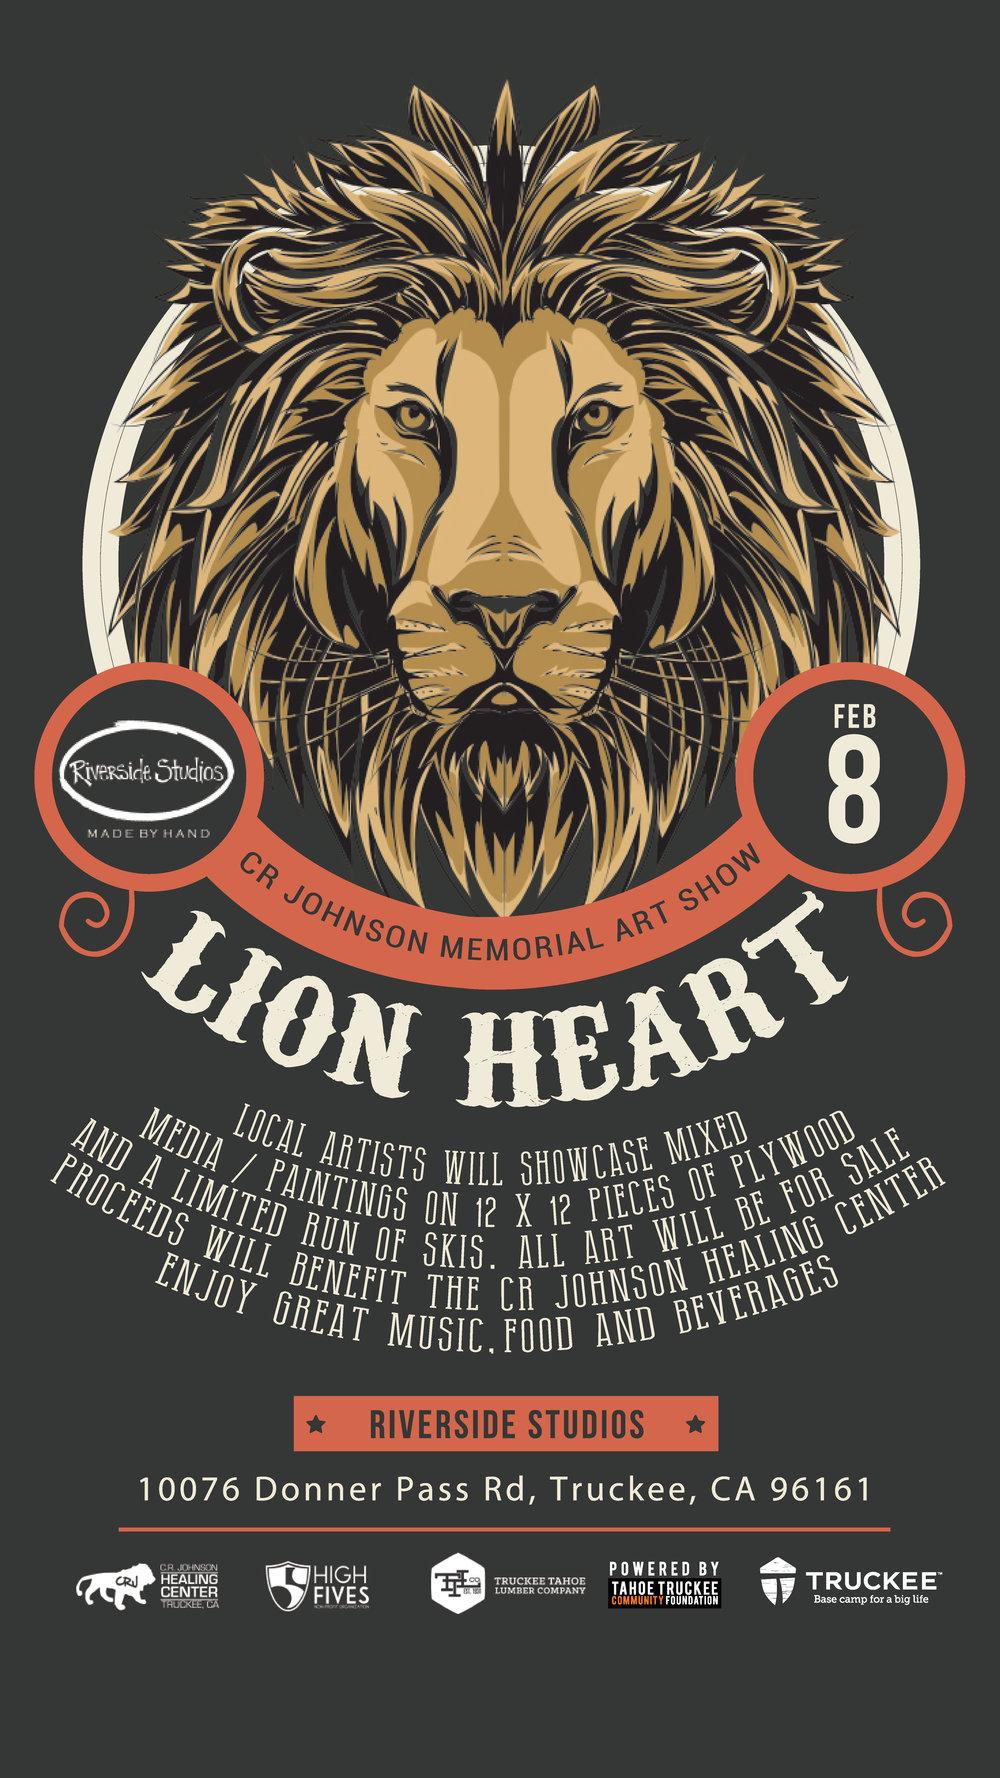 lionheart_2019_instastory-01.jpg